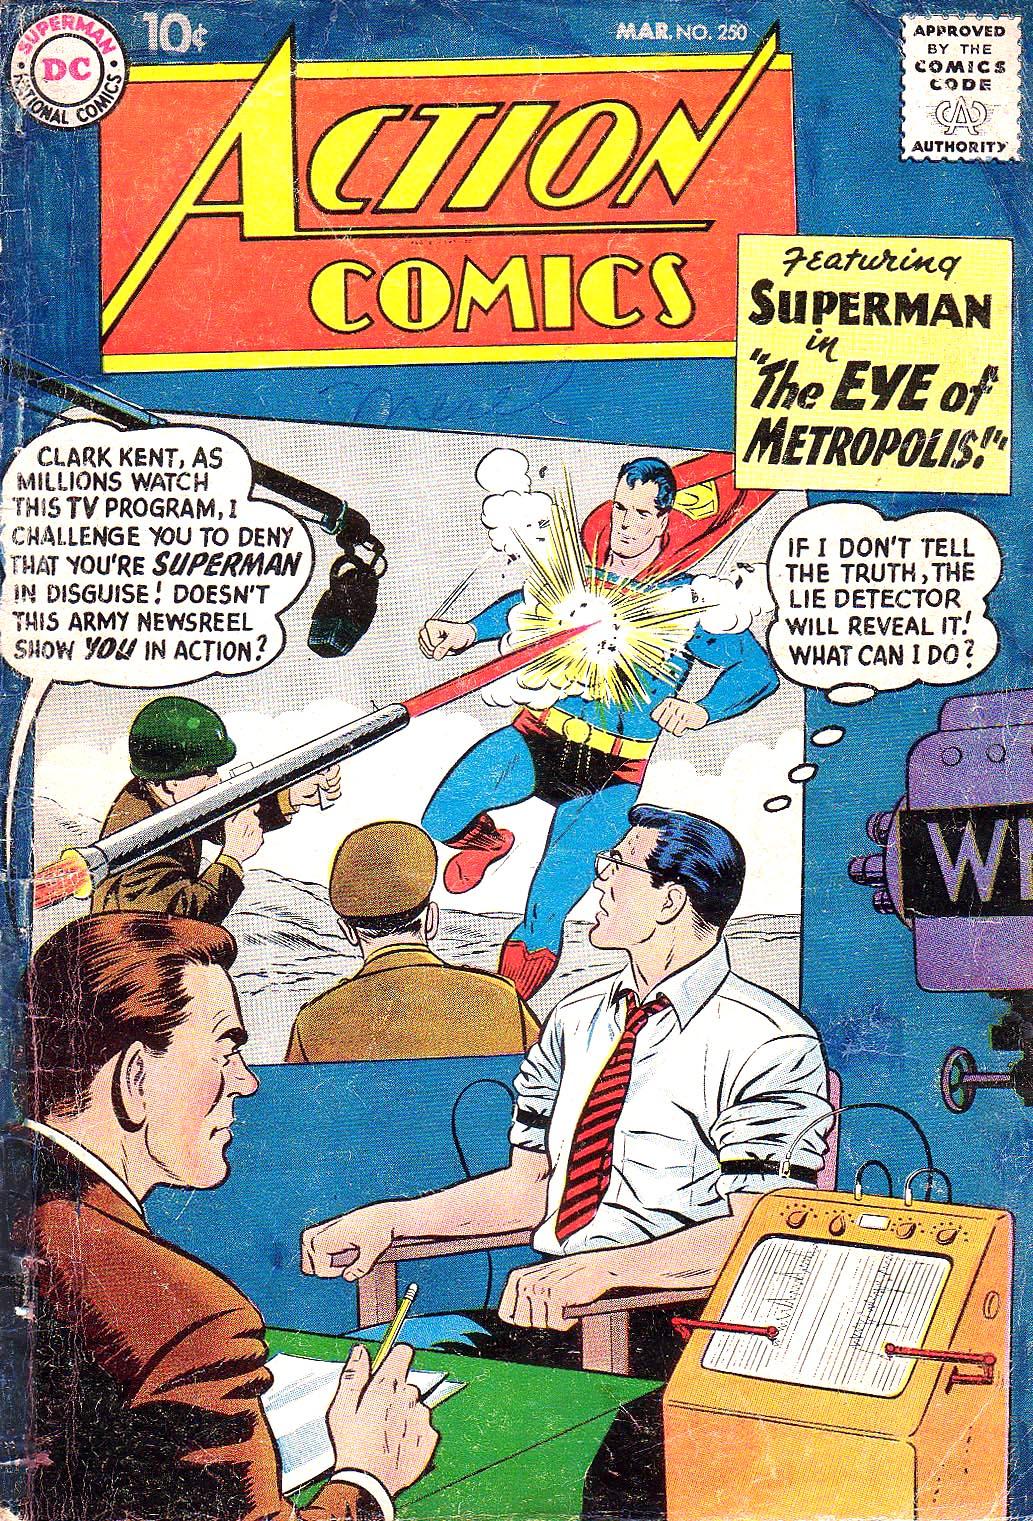 Action Comics (1938) 250 Page 1